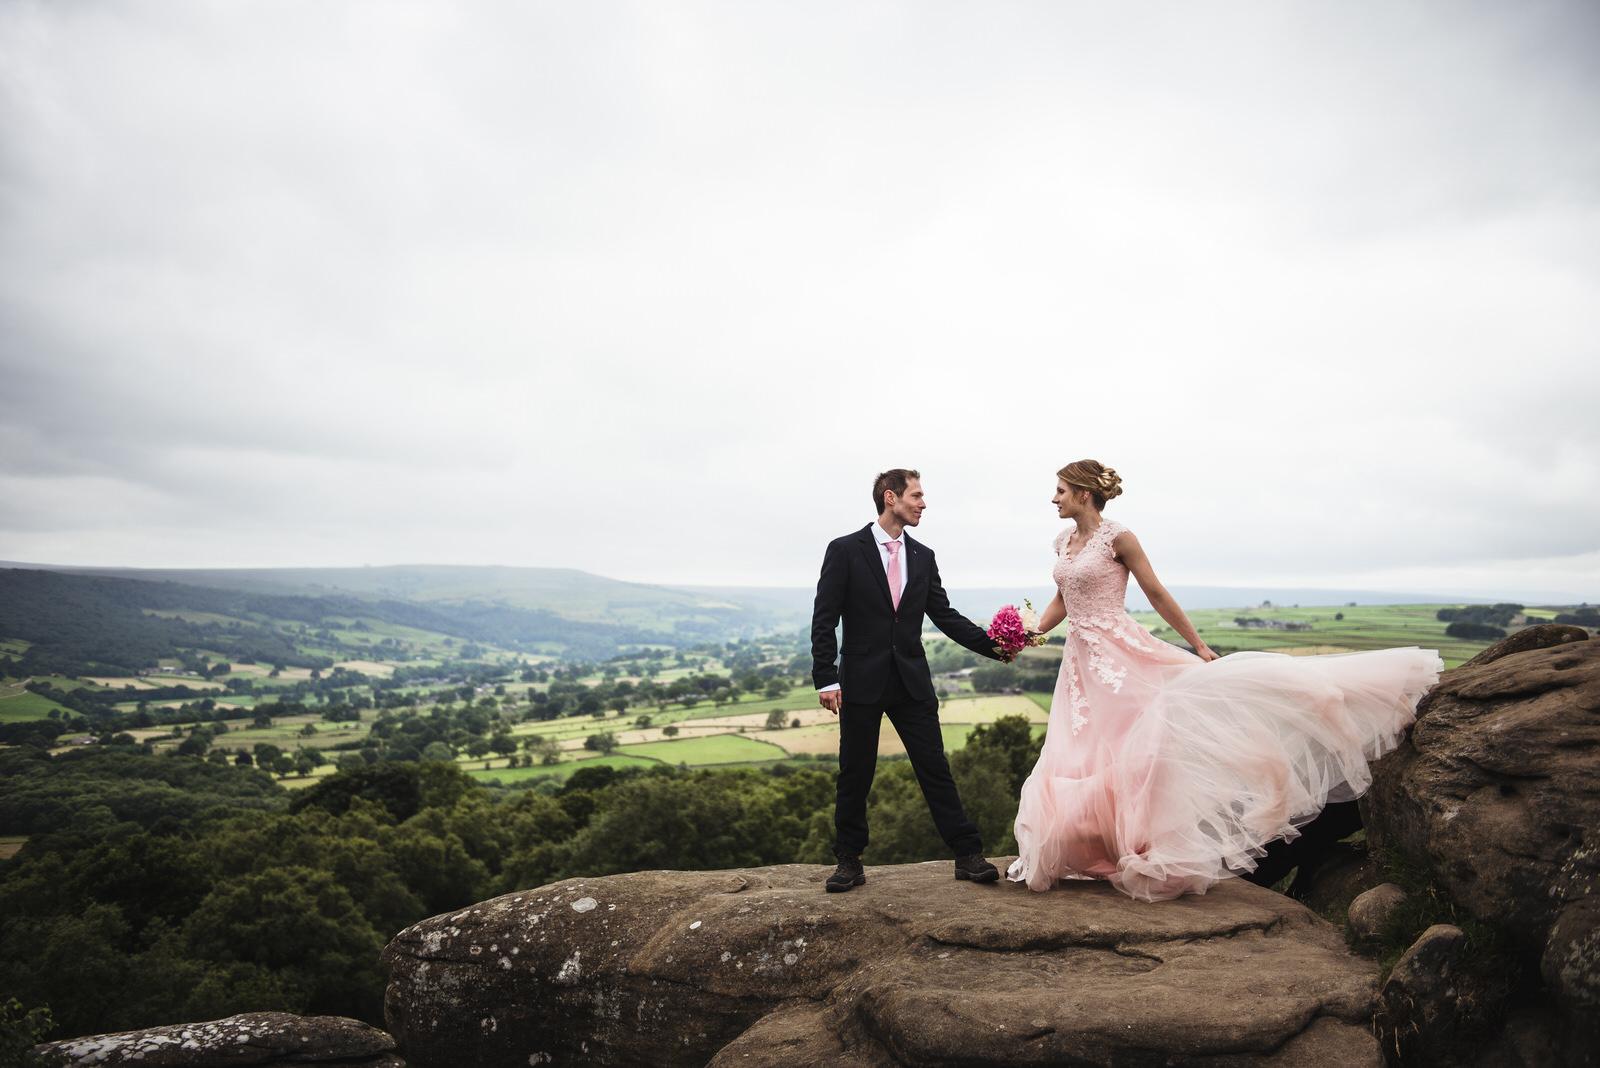 wedding portraits at Brimham Rocks